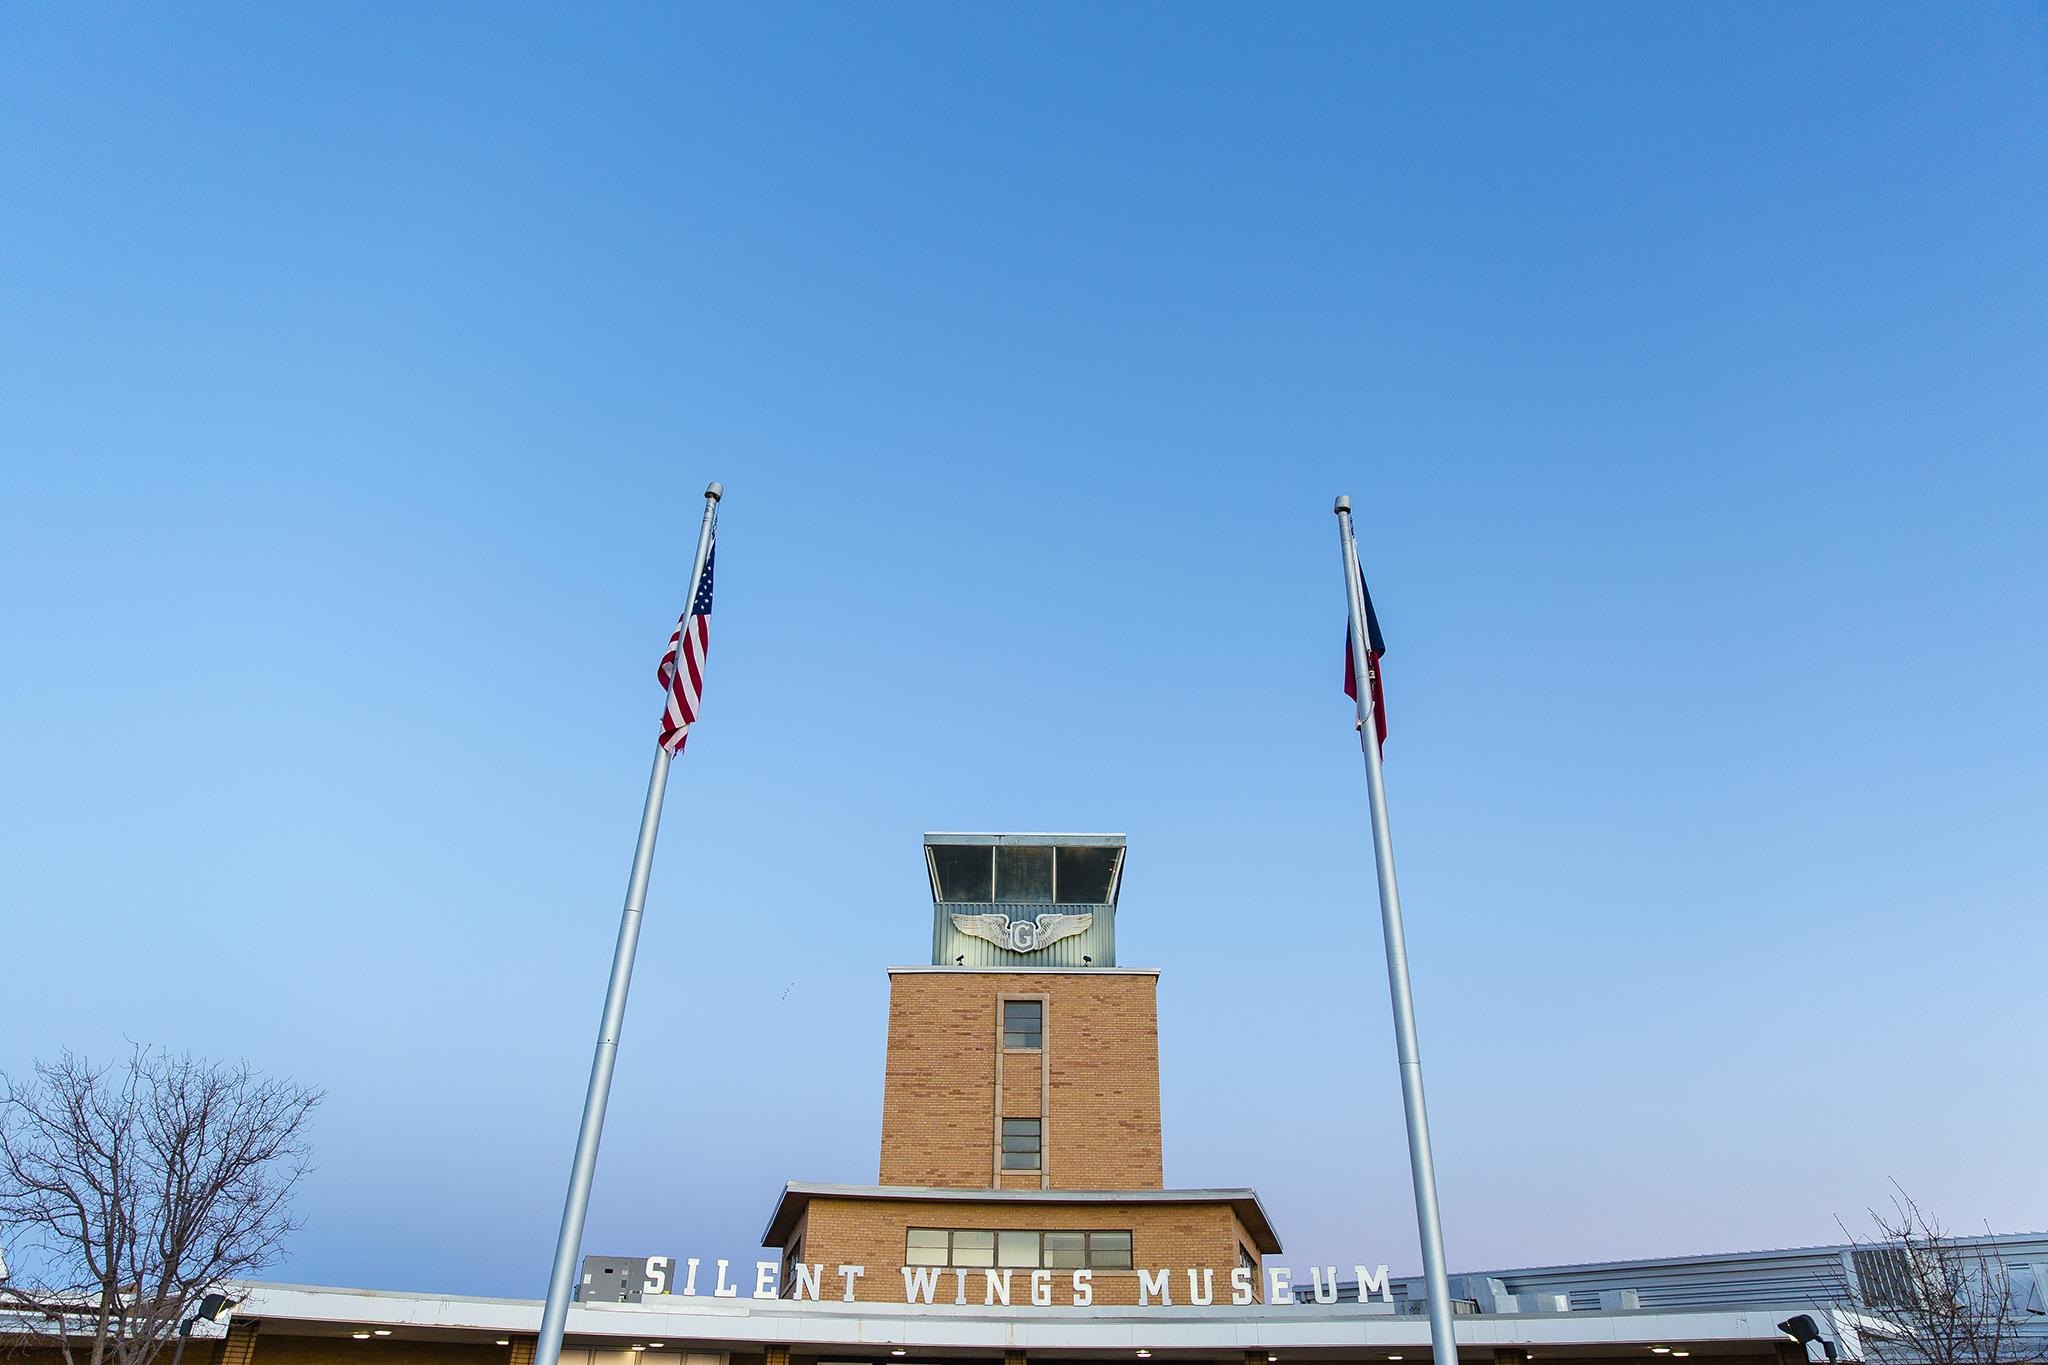 silent wings museum lubbock texas, wedding reception, big blue sky, world war II